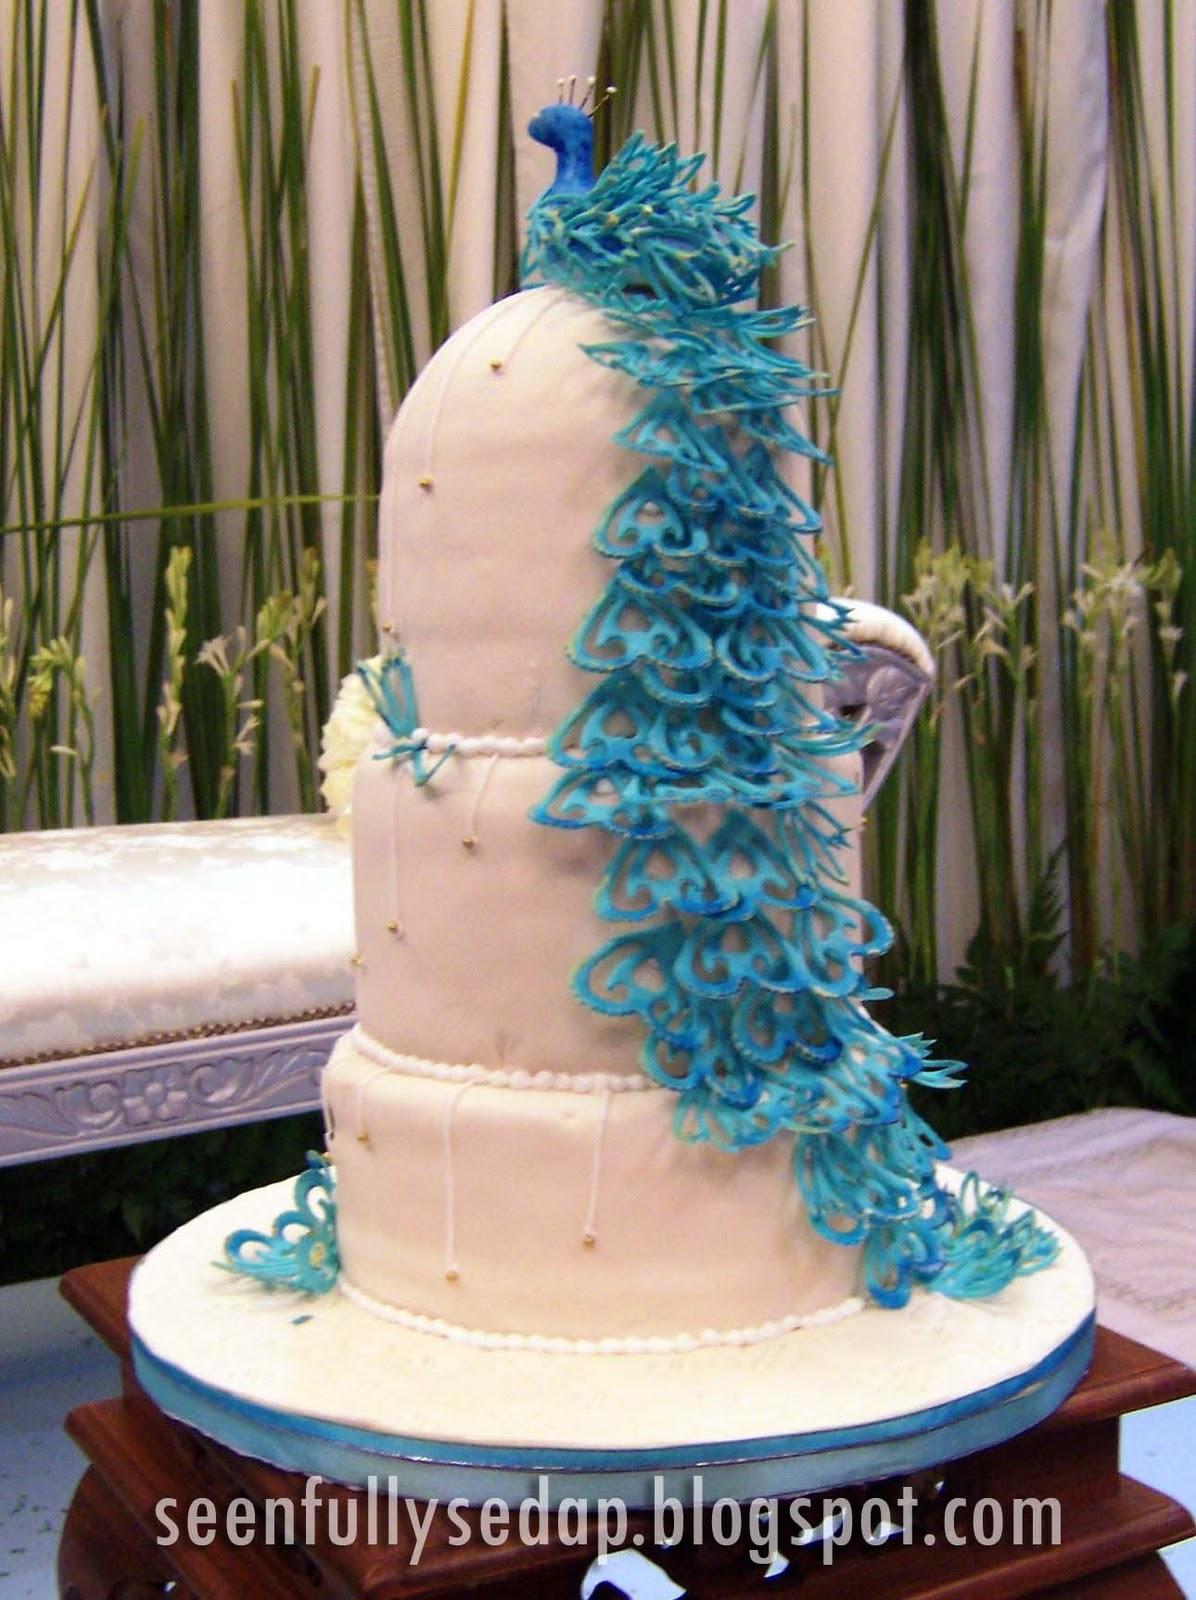 Seenfully Sedap Wedding Cake The Peacock Ezani s Wedding